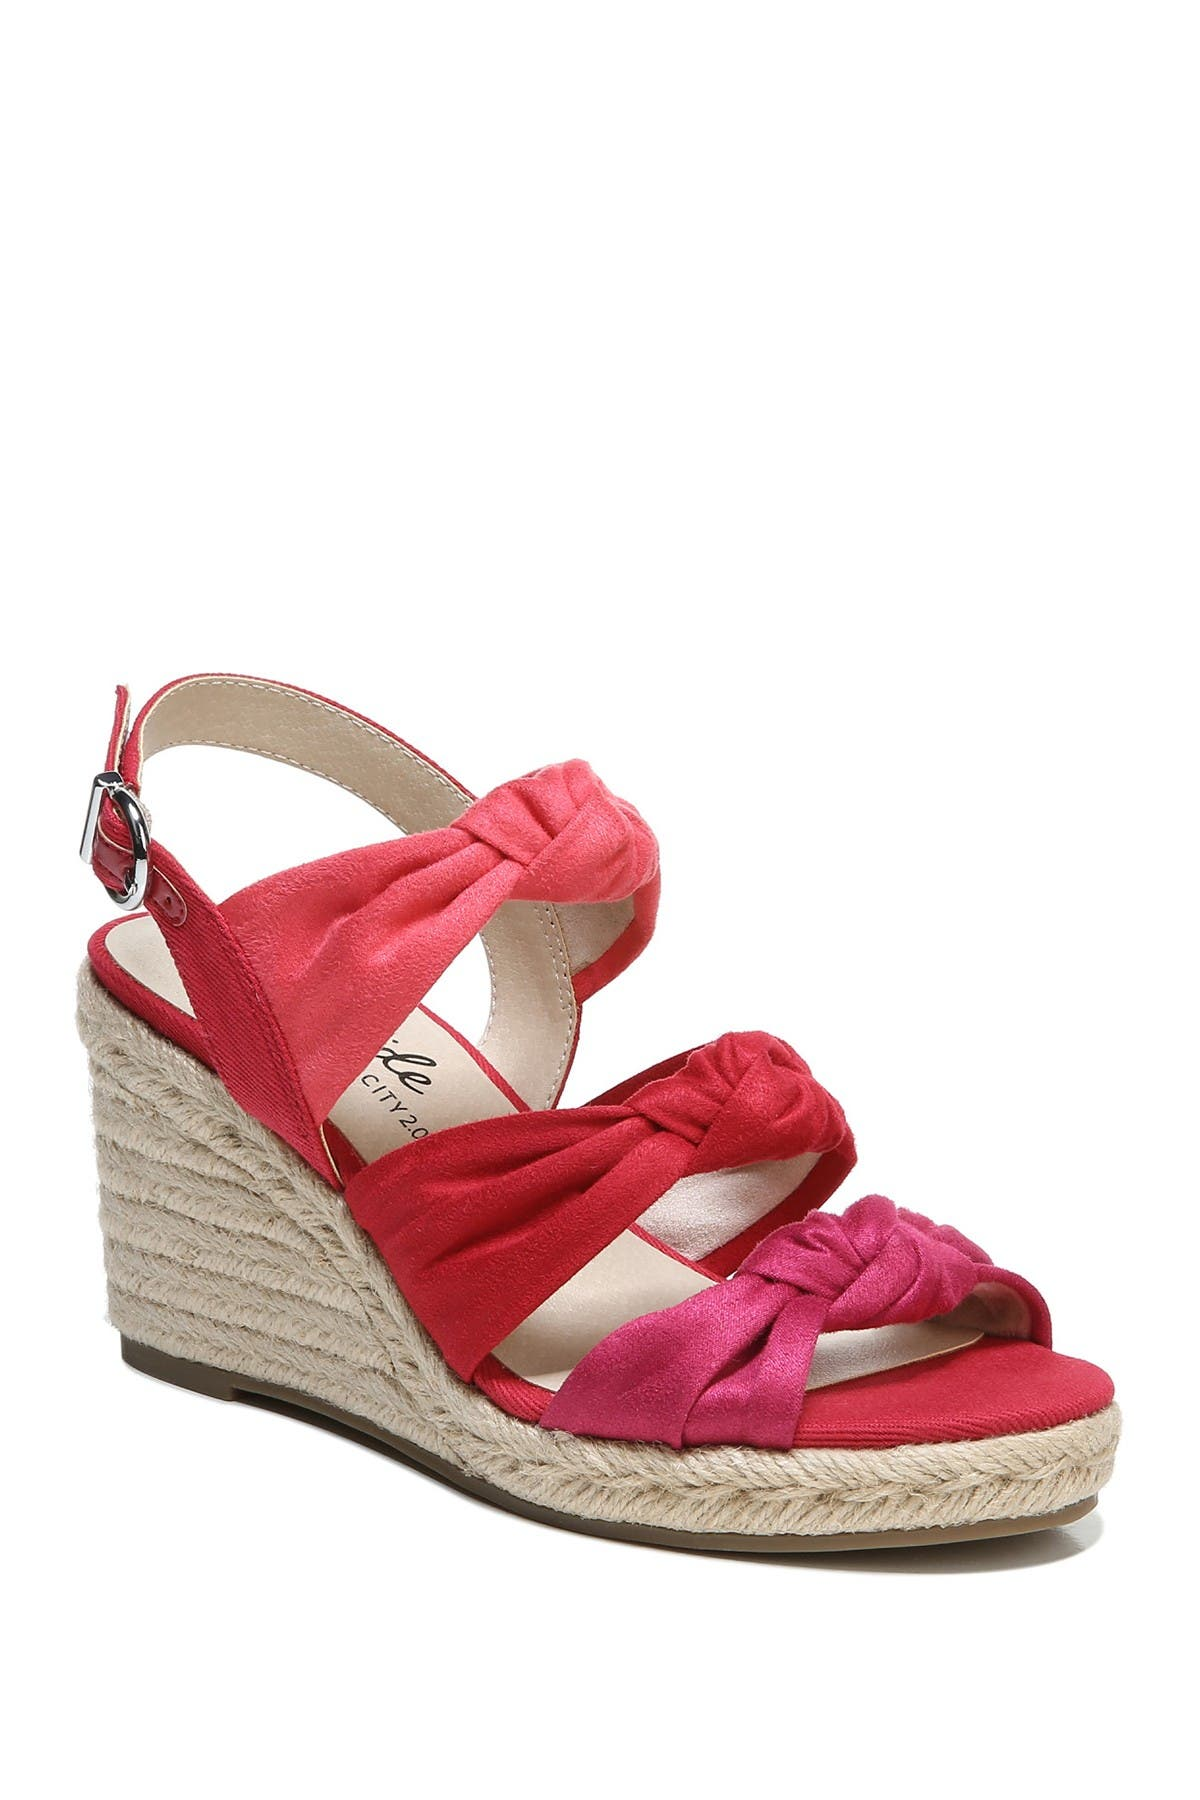 Image of LifeStride Talent Wedge Sandal